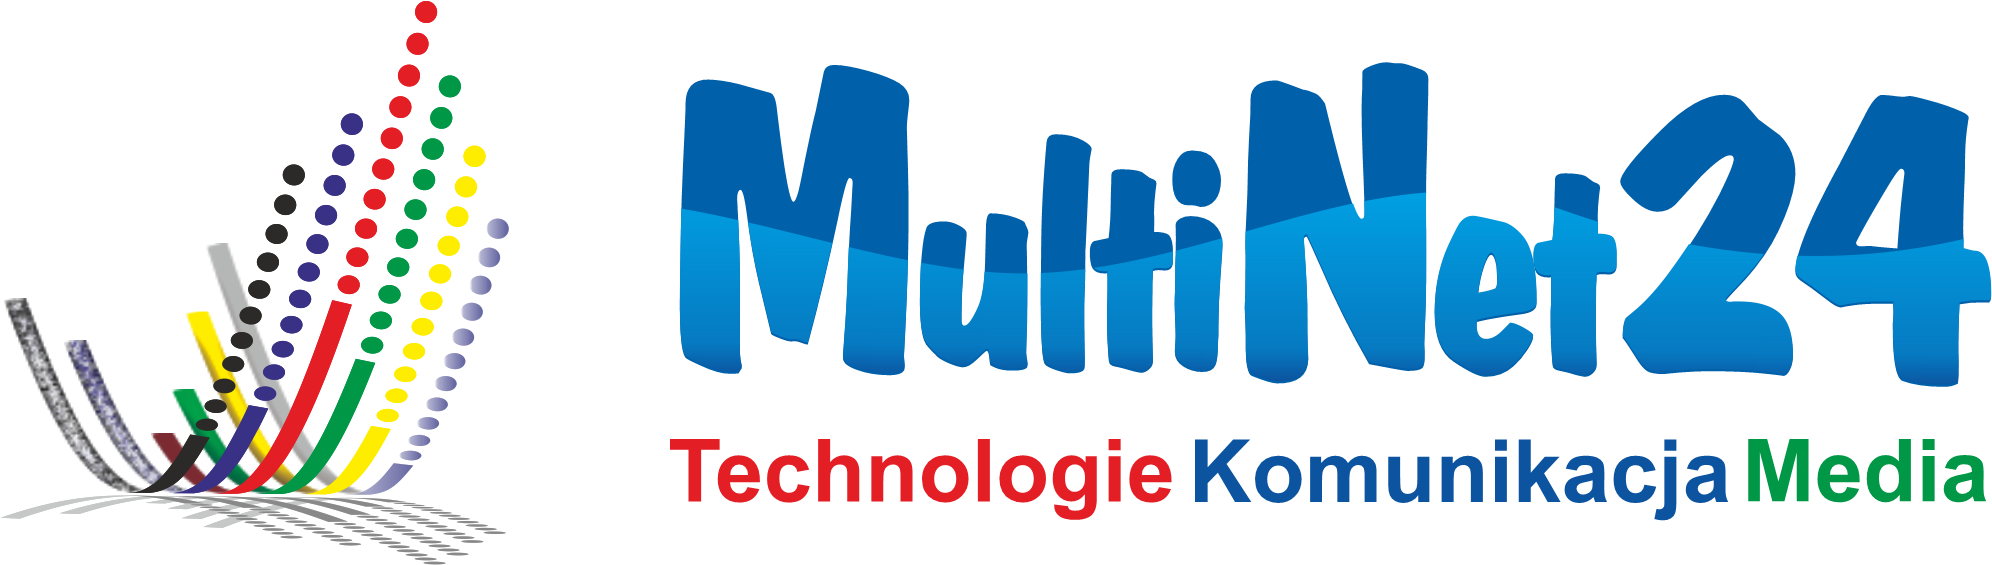 Multinet24.pl